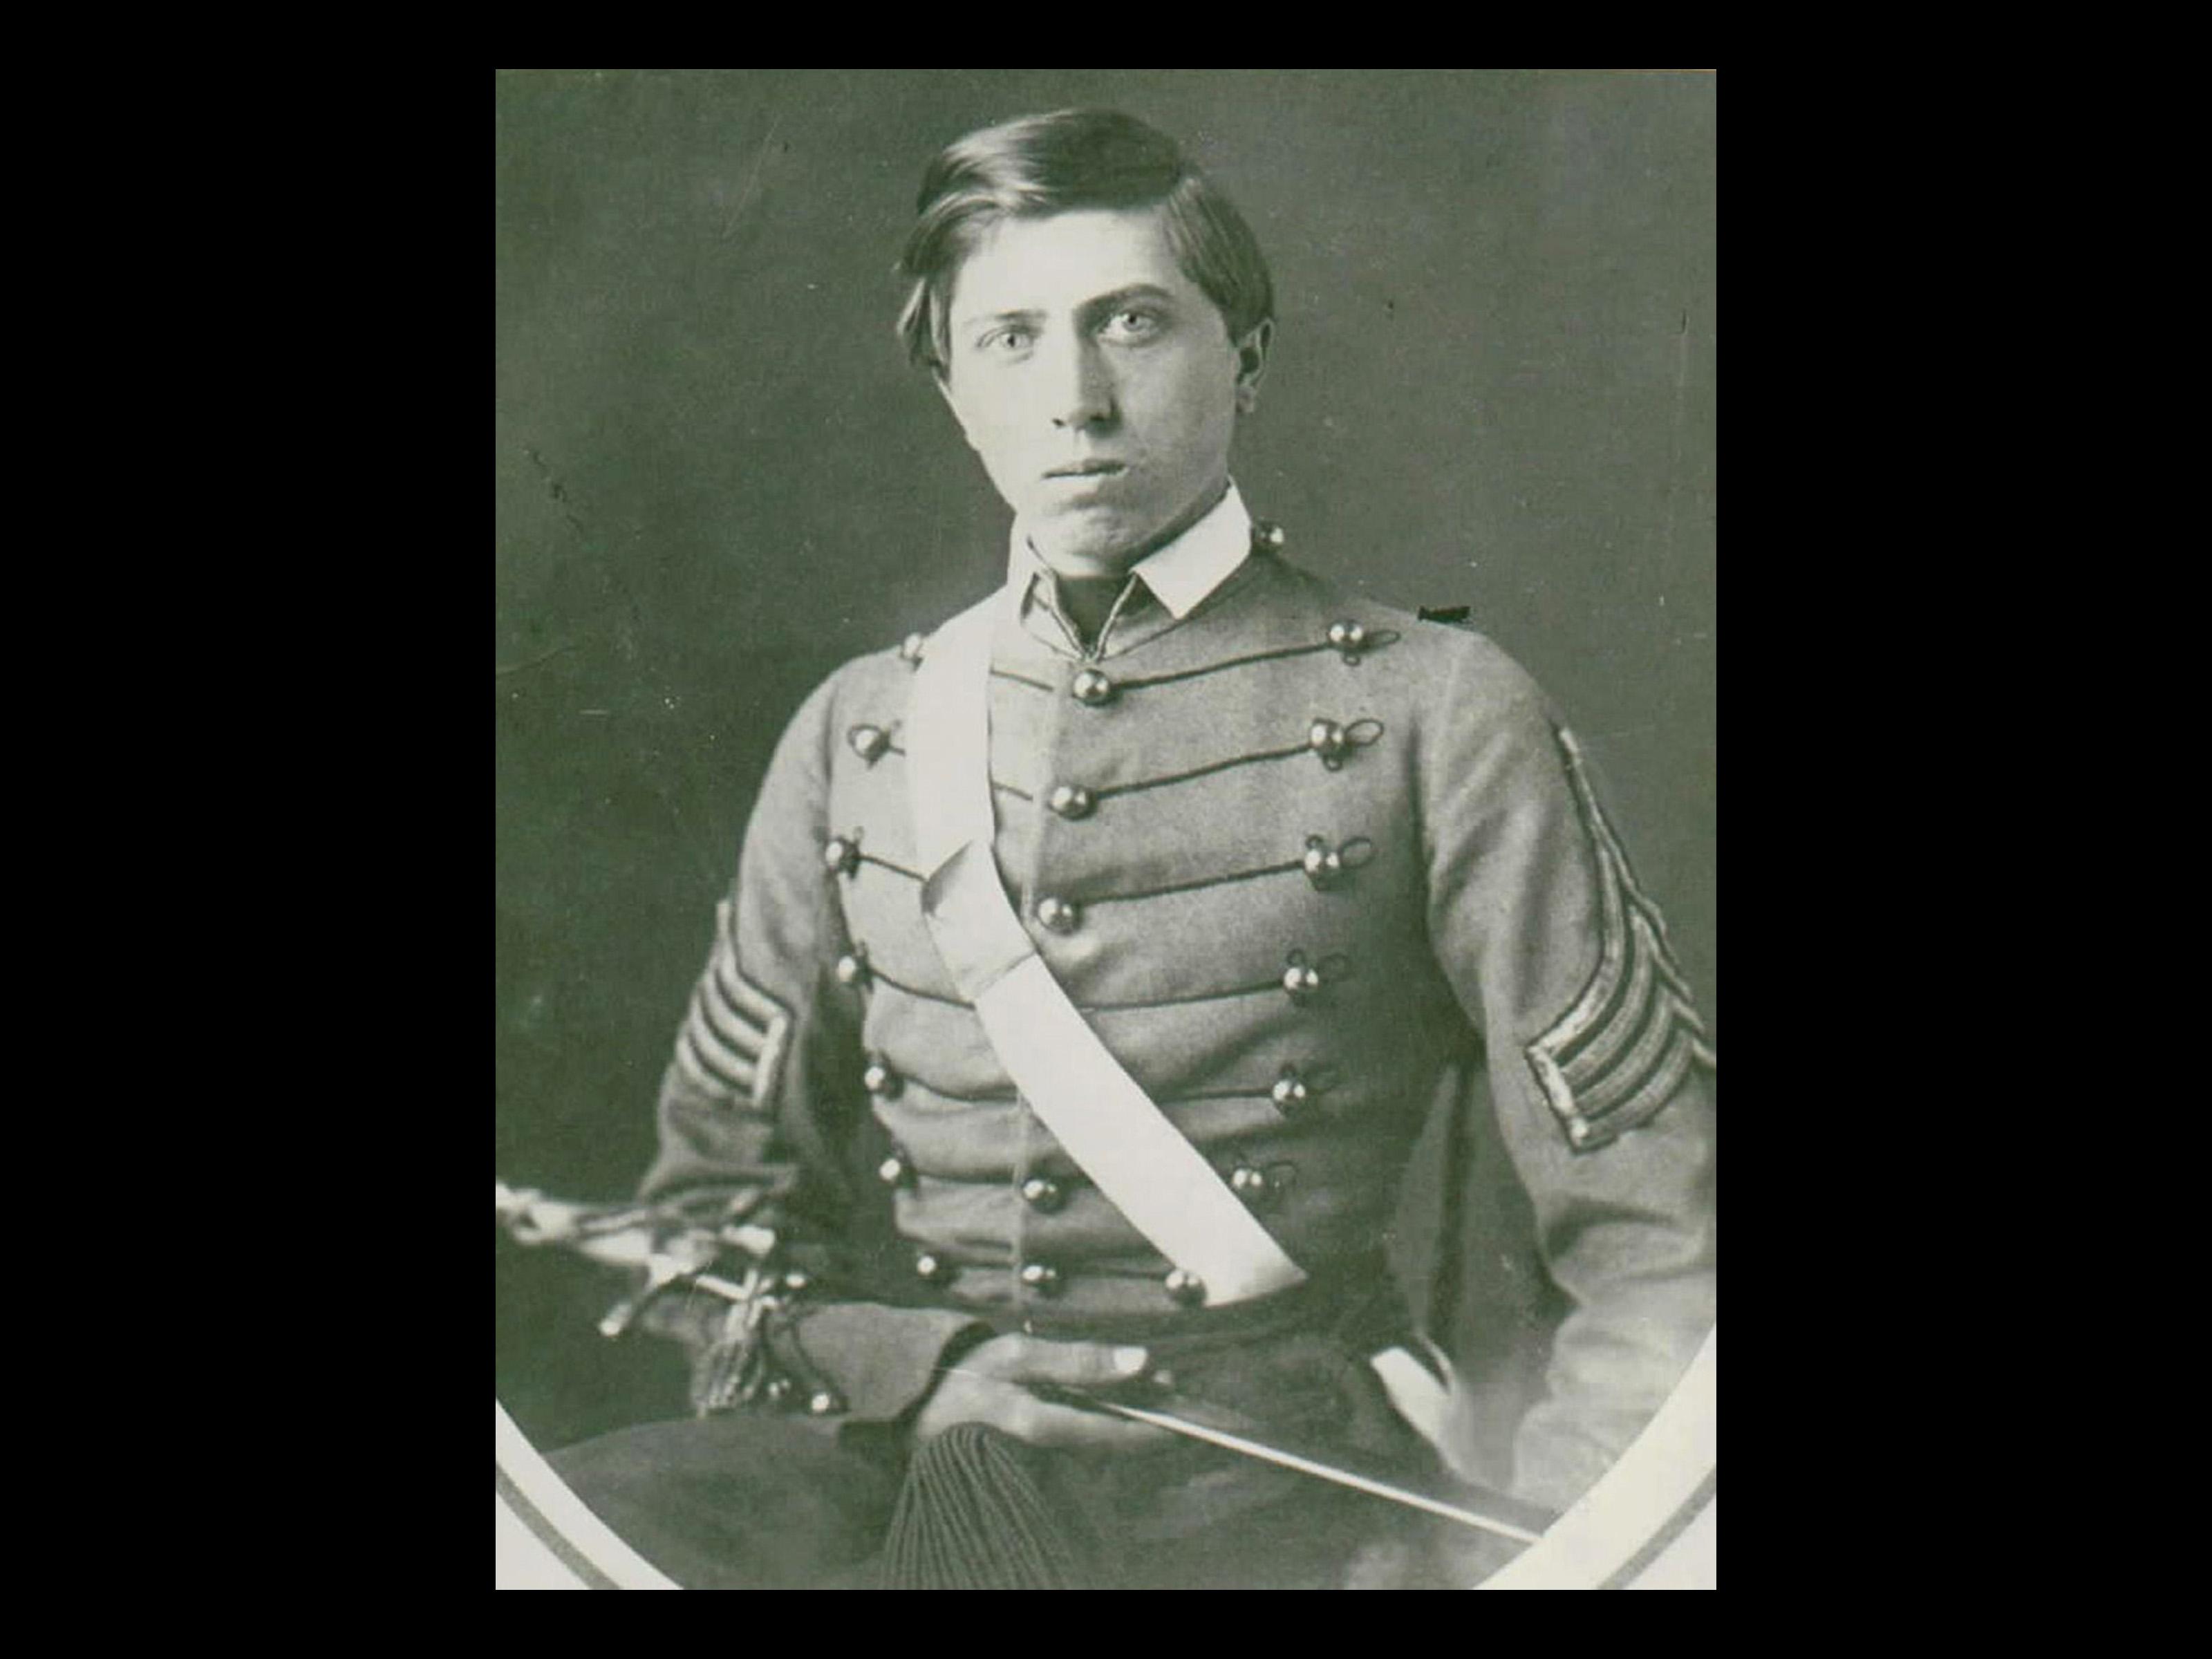 civil war hero receives medal of honor medal of honor